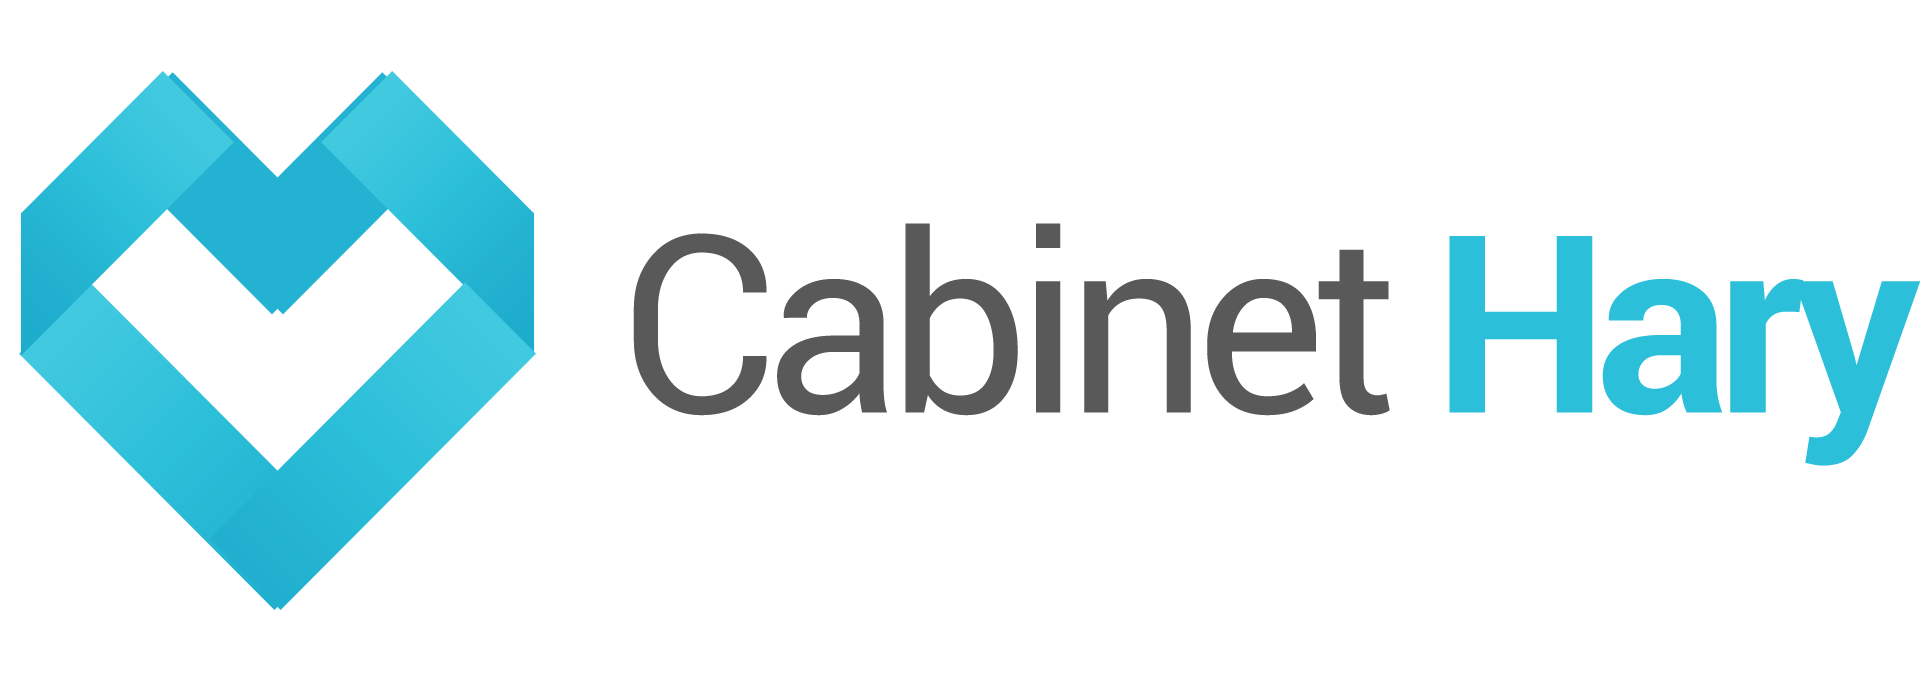 Cabinet Hary